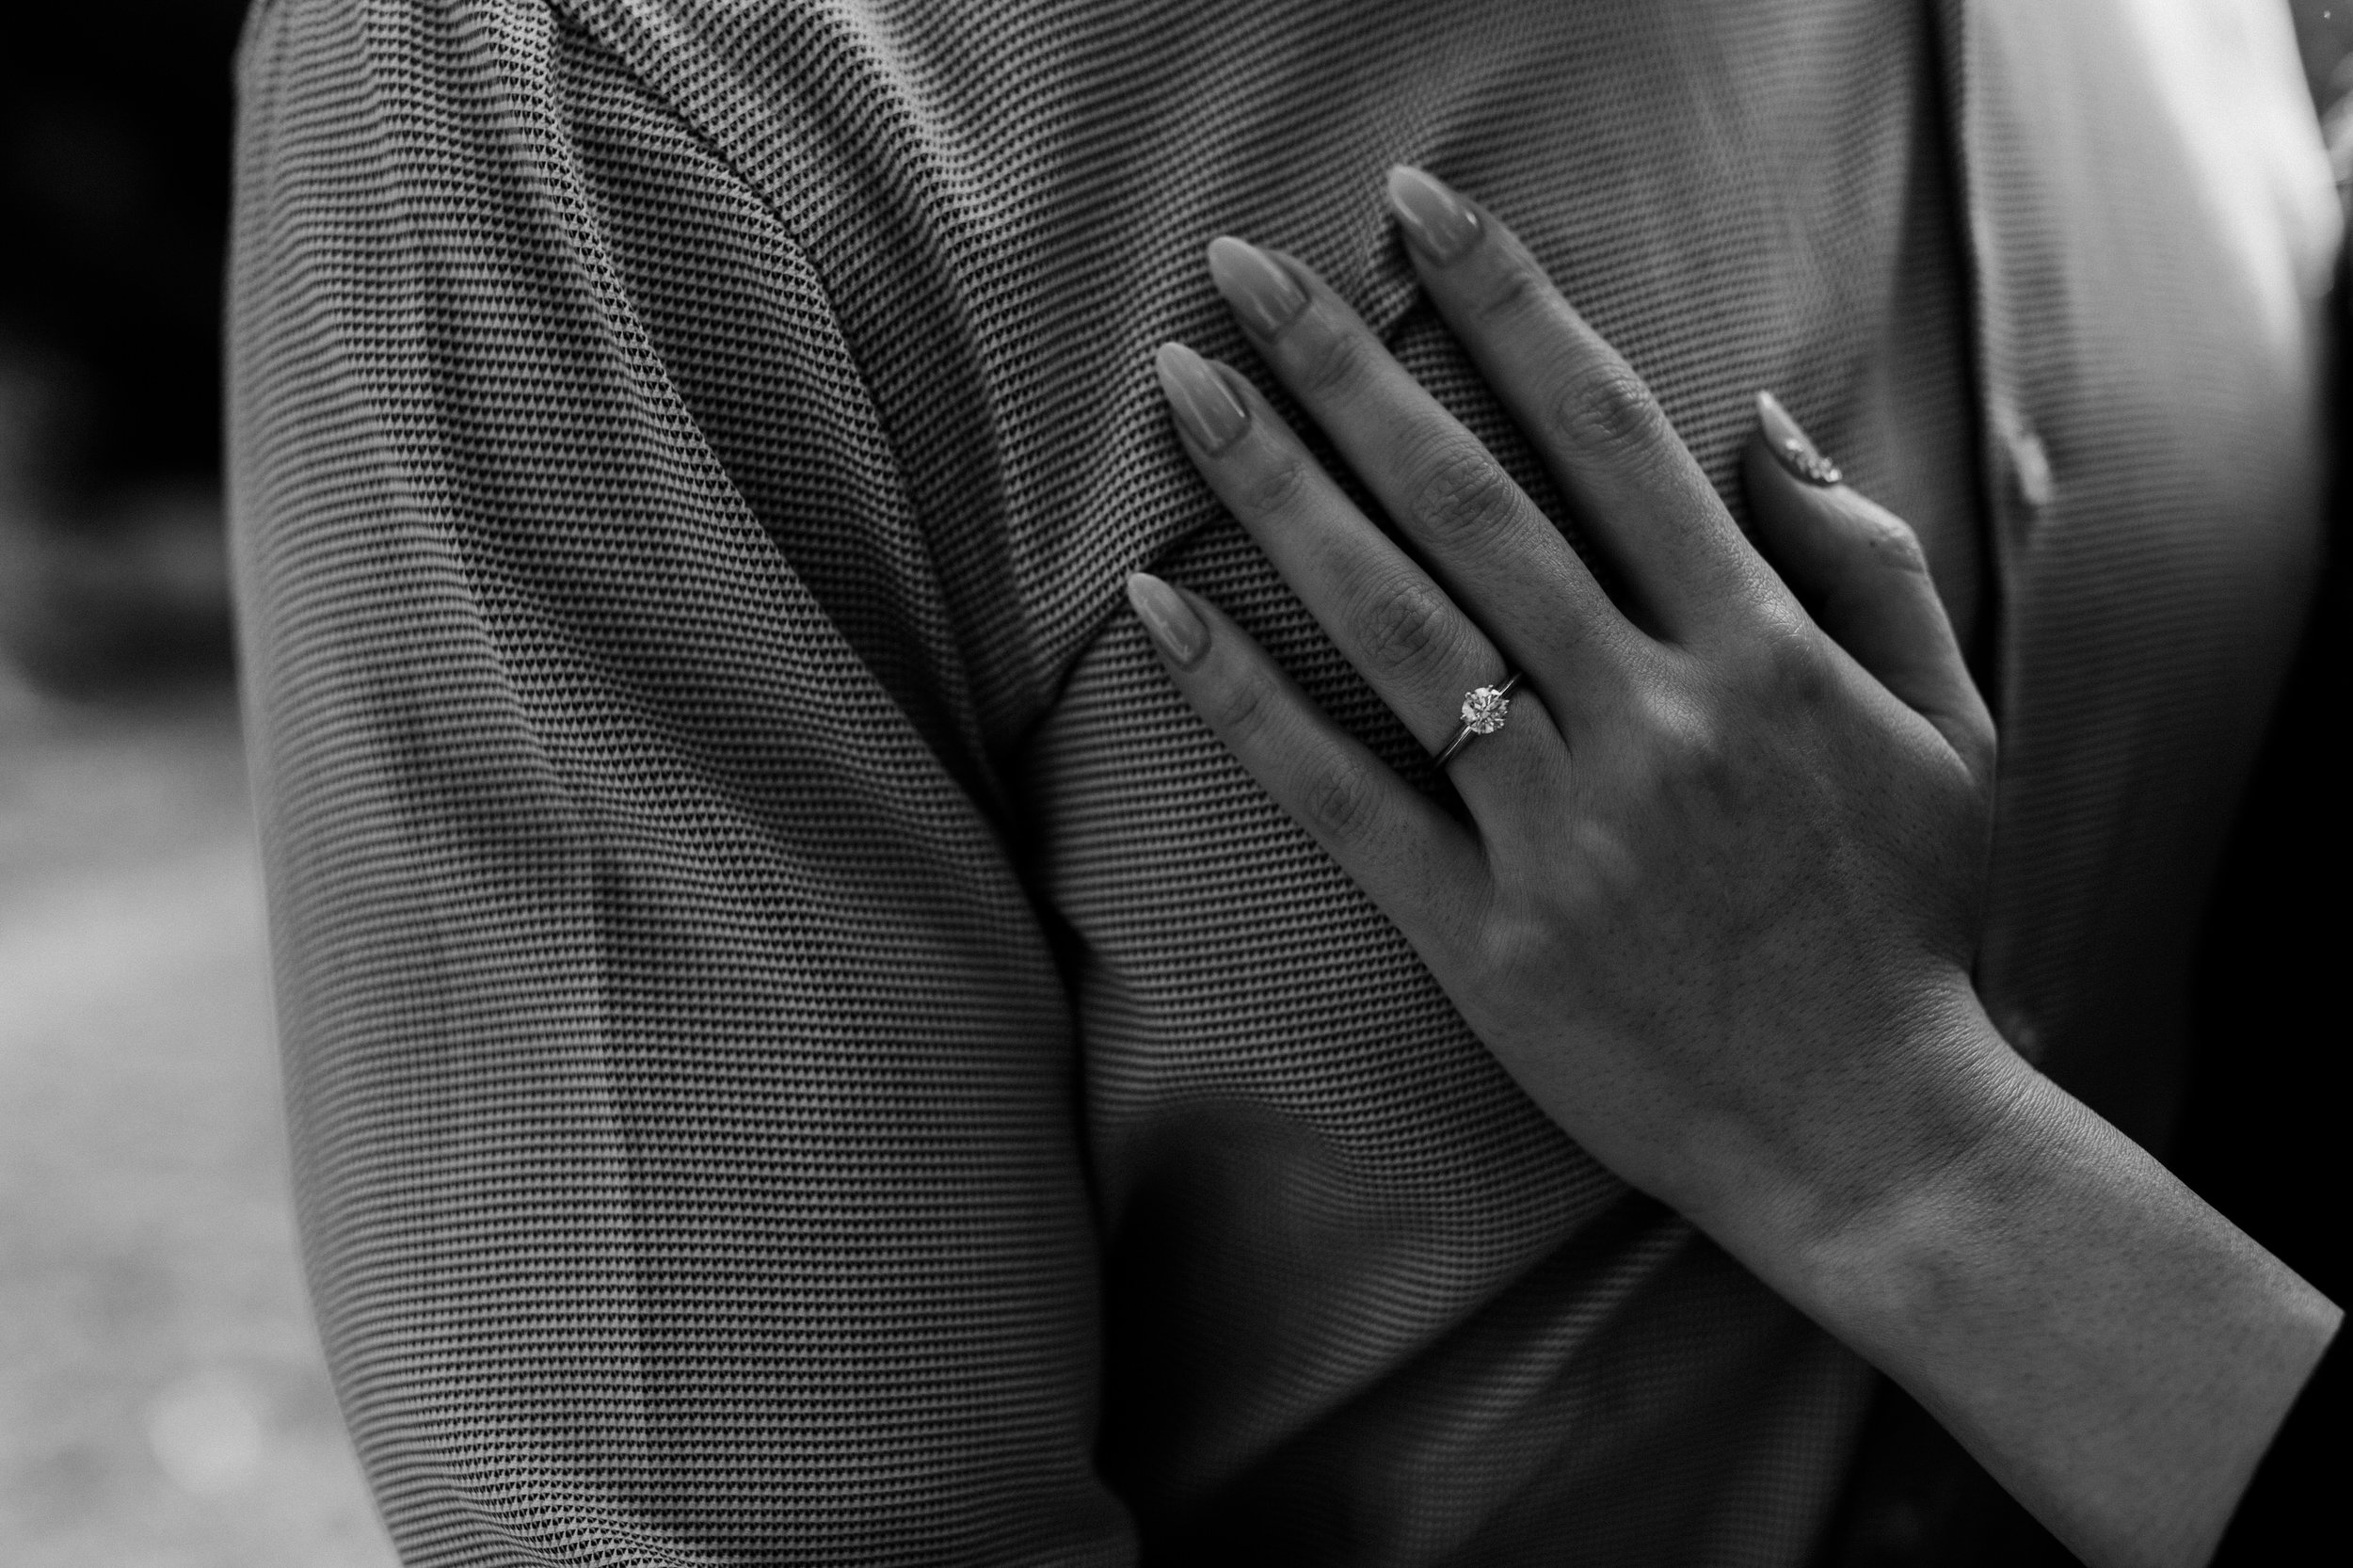 Sunshine Coast Elopement Photos - Forest Wedding - Beach Wedding - Sunshine Coast Wedding Photographer - Vancouver Wedding Photographer - Vancouver Wedding Videographer - 1009.JPG